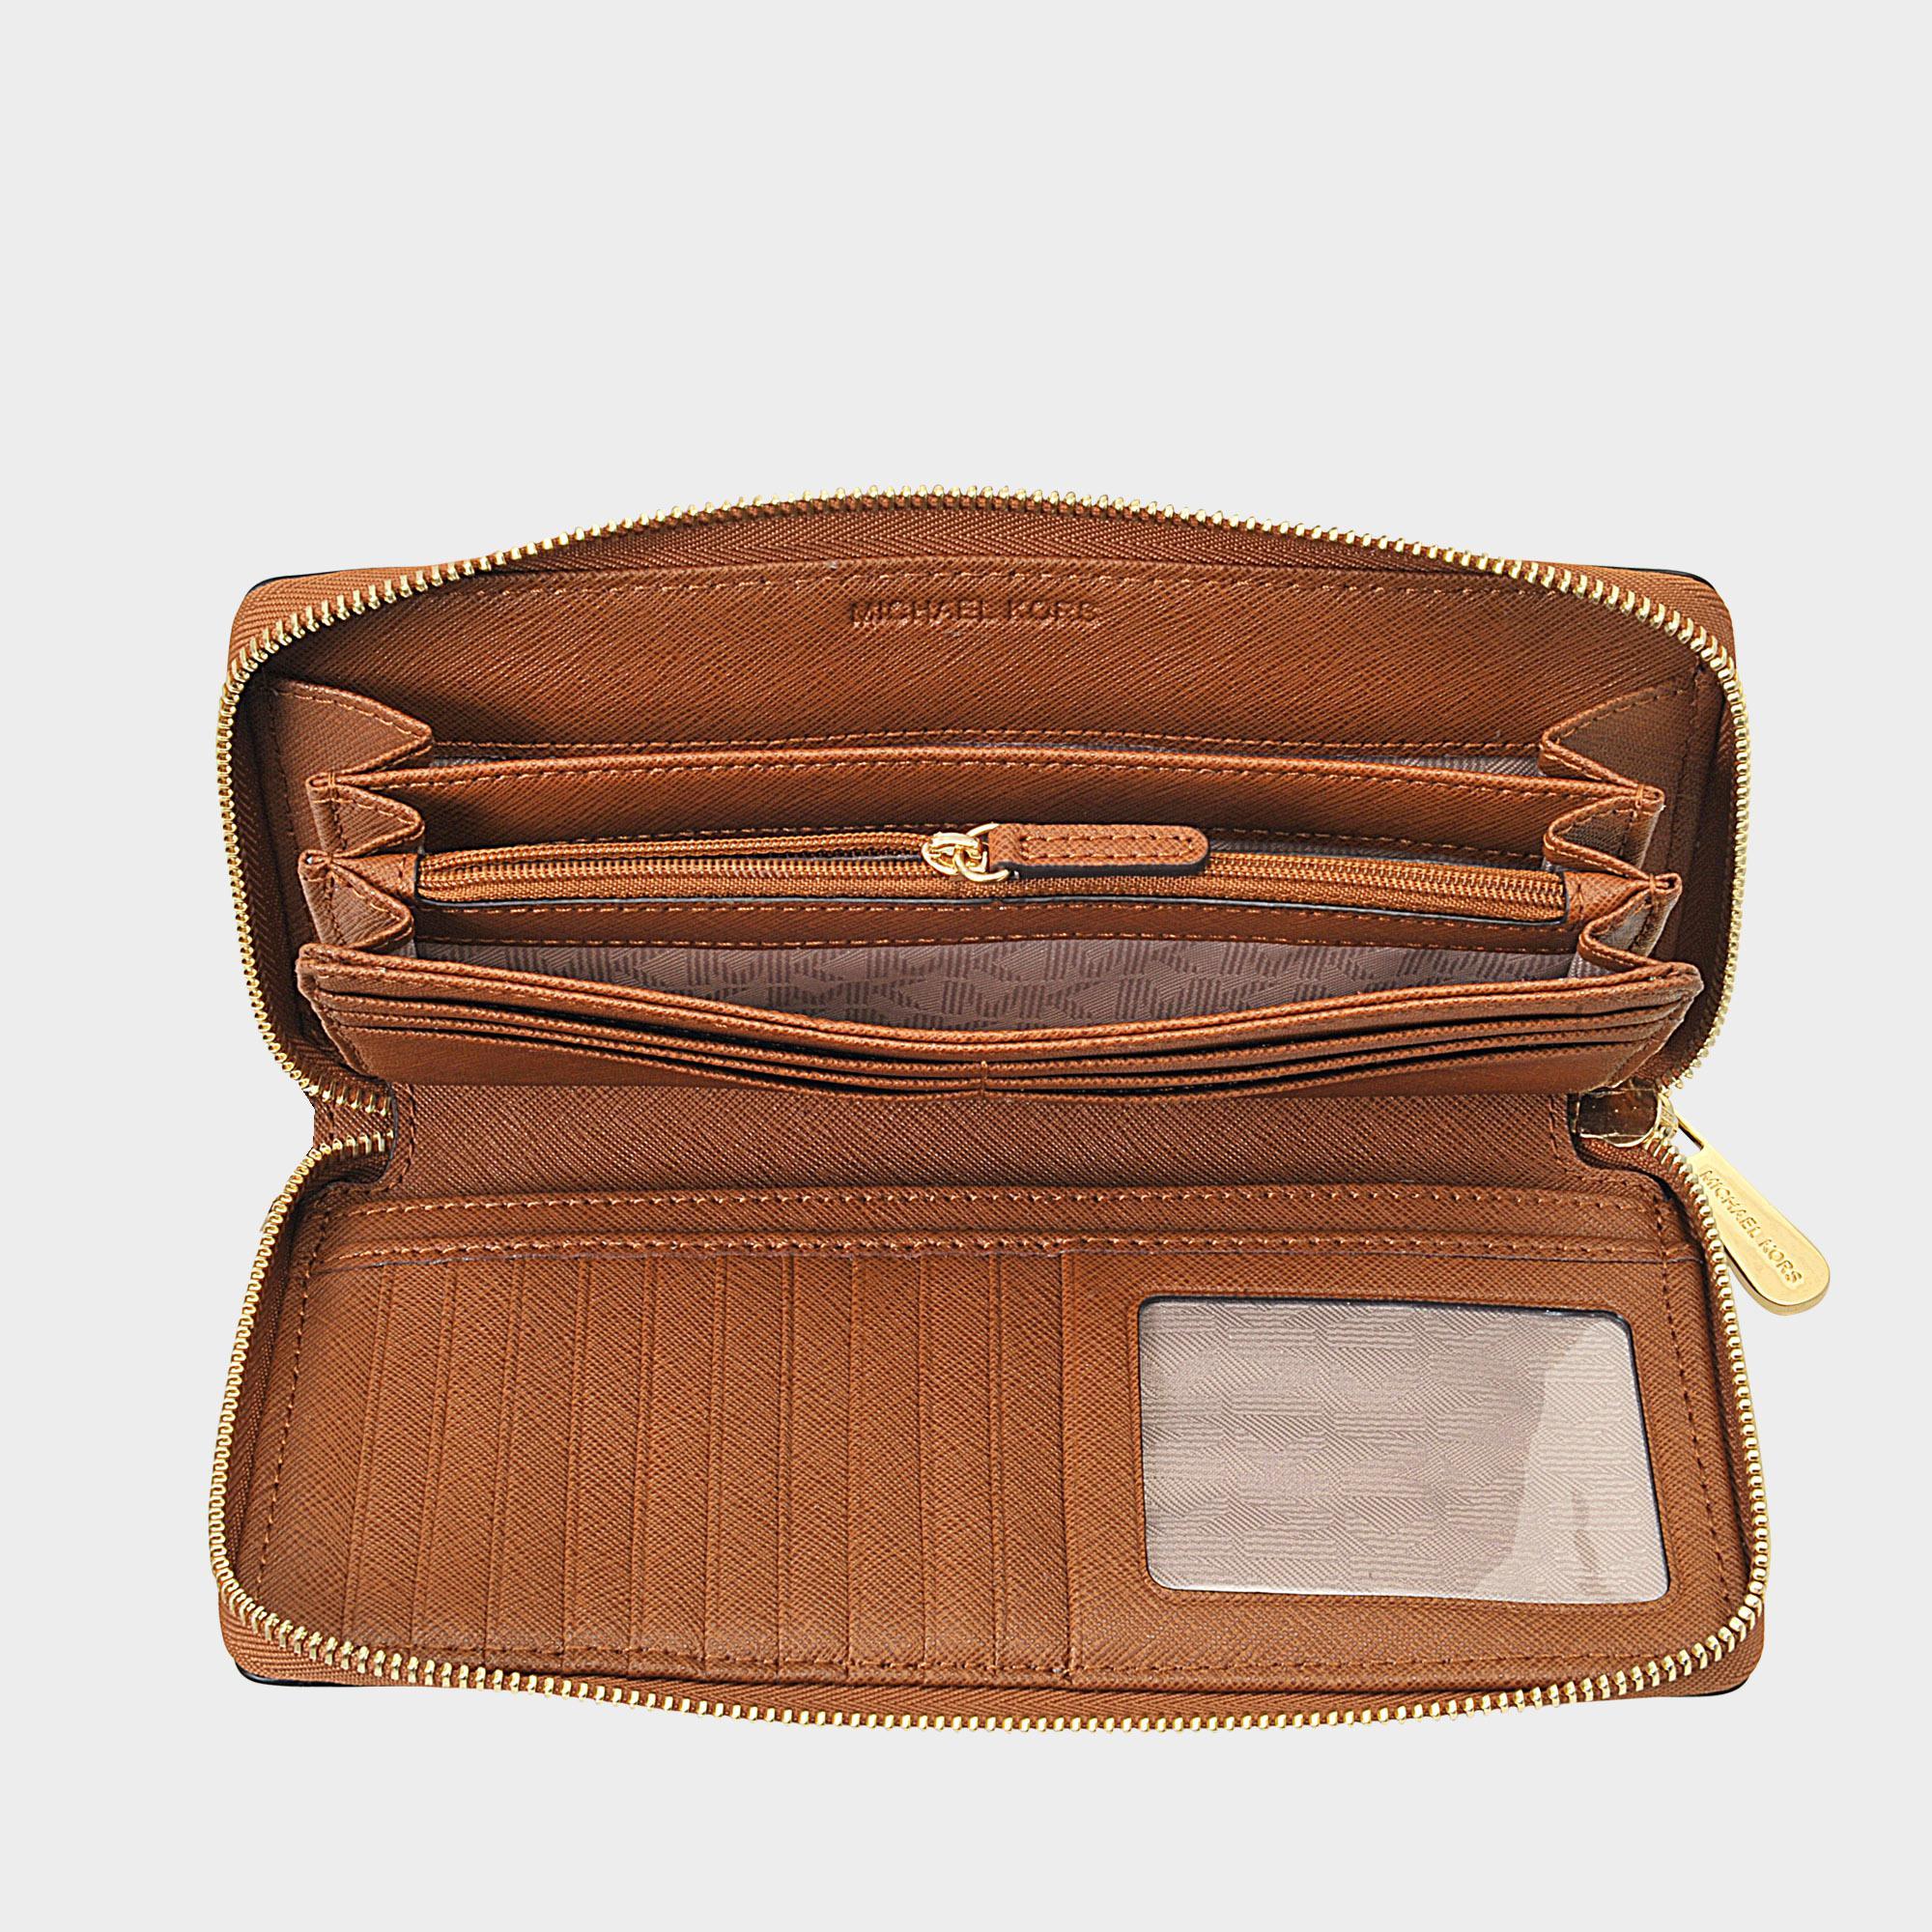 4299b8f9e2e22 MICHAEL Michael Kors Jet Set Travel Continental Wallet in Brown - Lyst